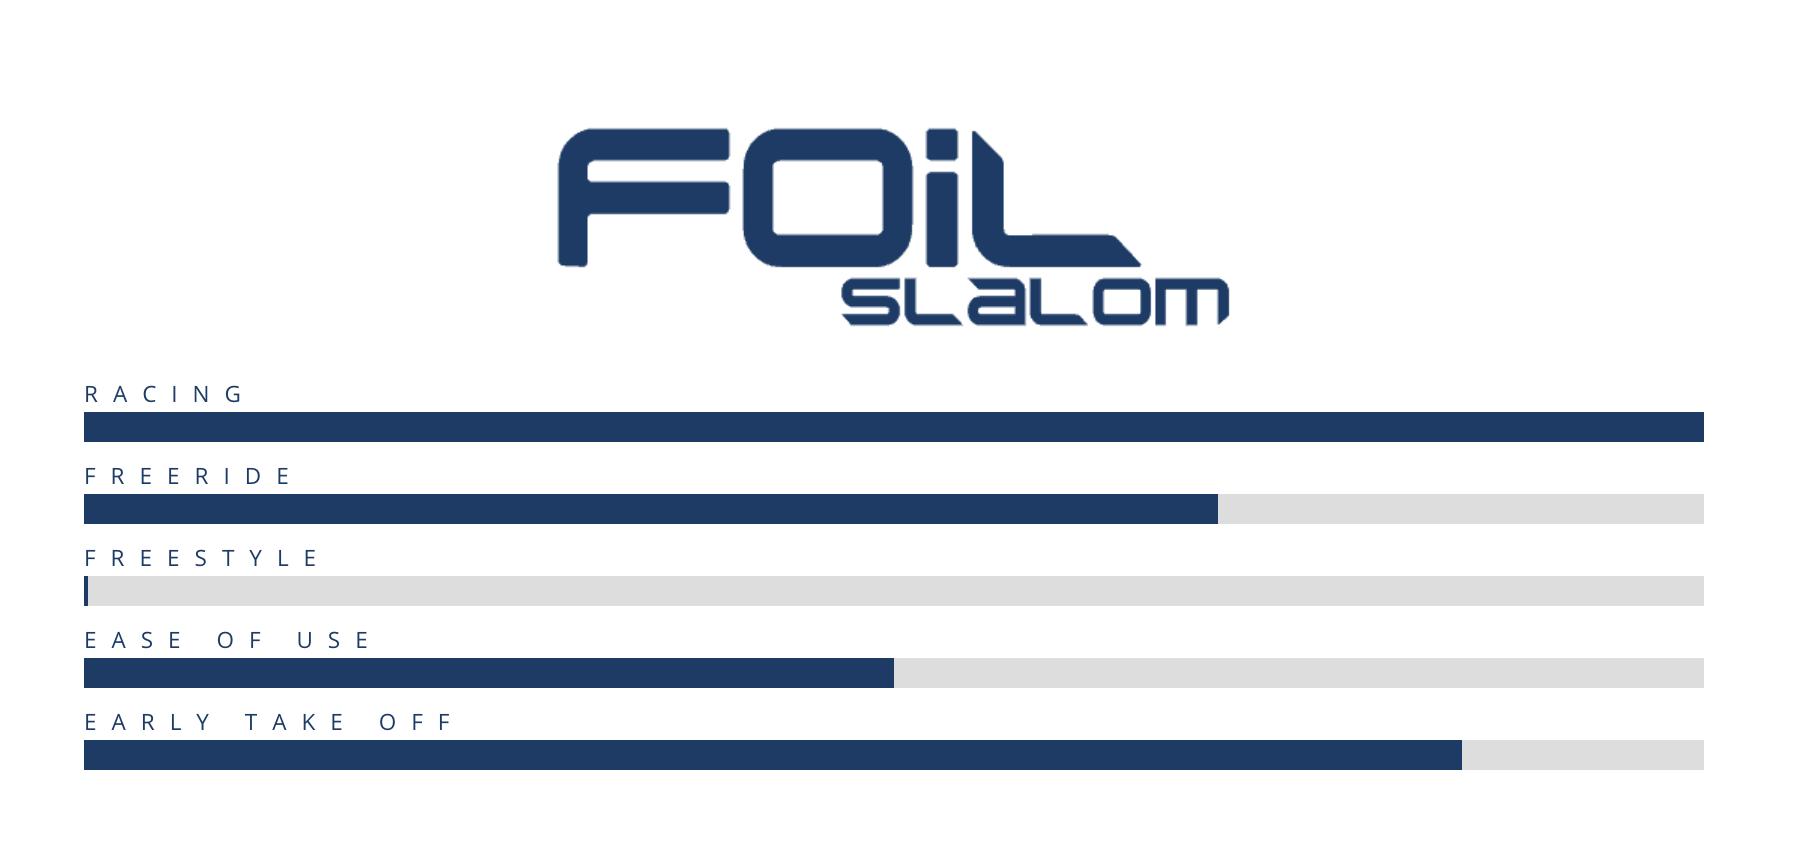 STARBOARD FOIL SLALOM 91 Carbon Reflex 2021